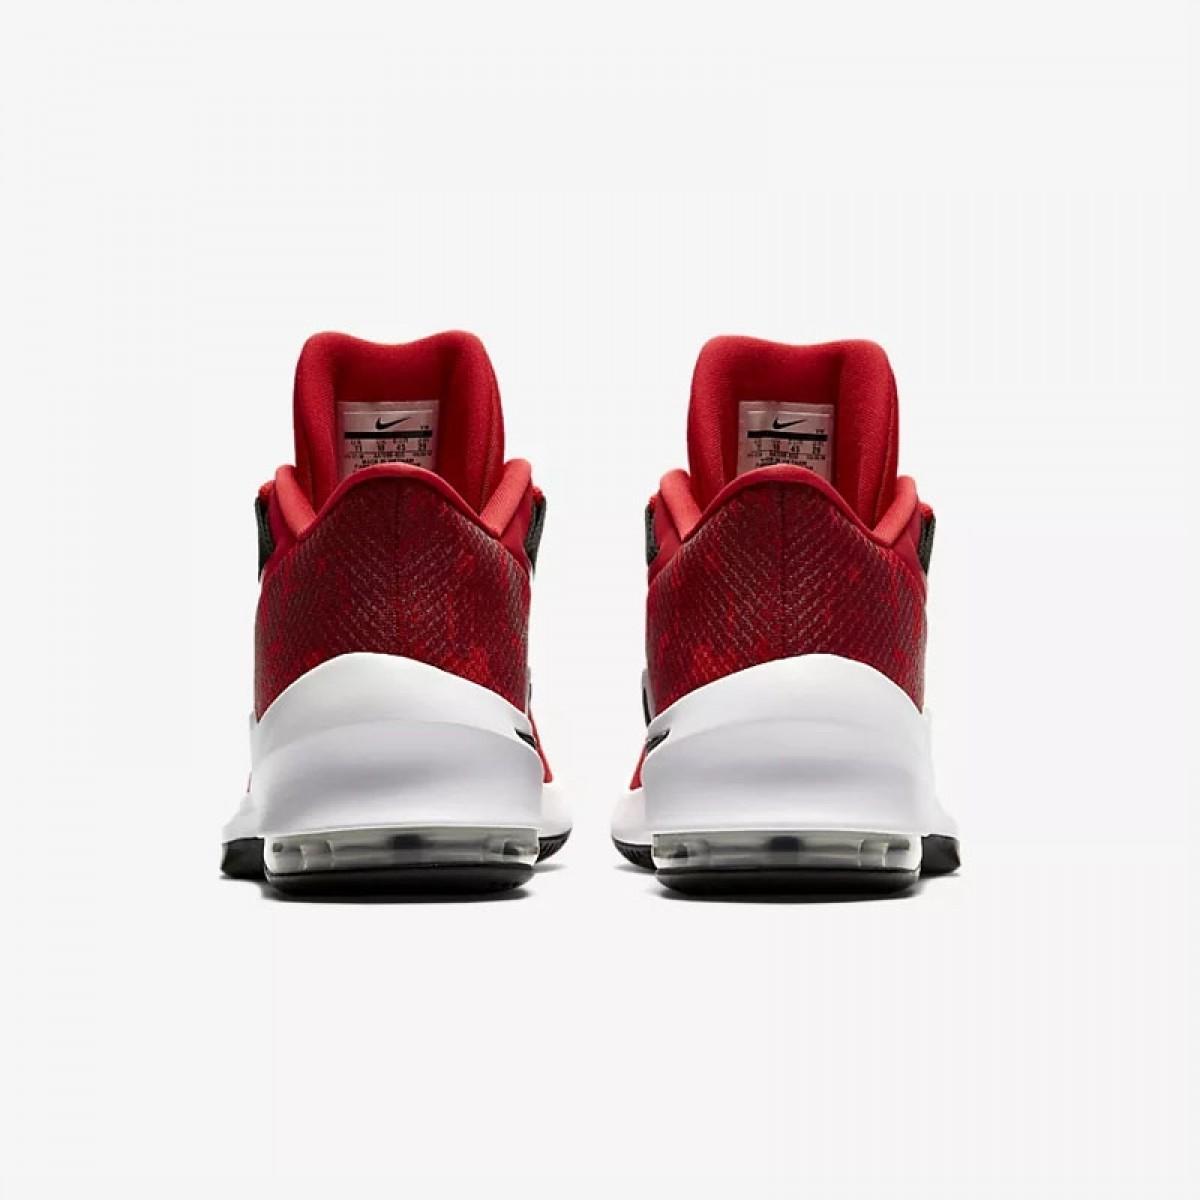 Nike Air Max Infuriate II 'Red Pixel' AH3426-600